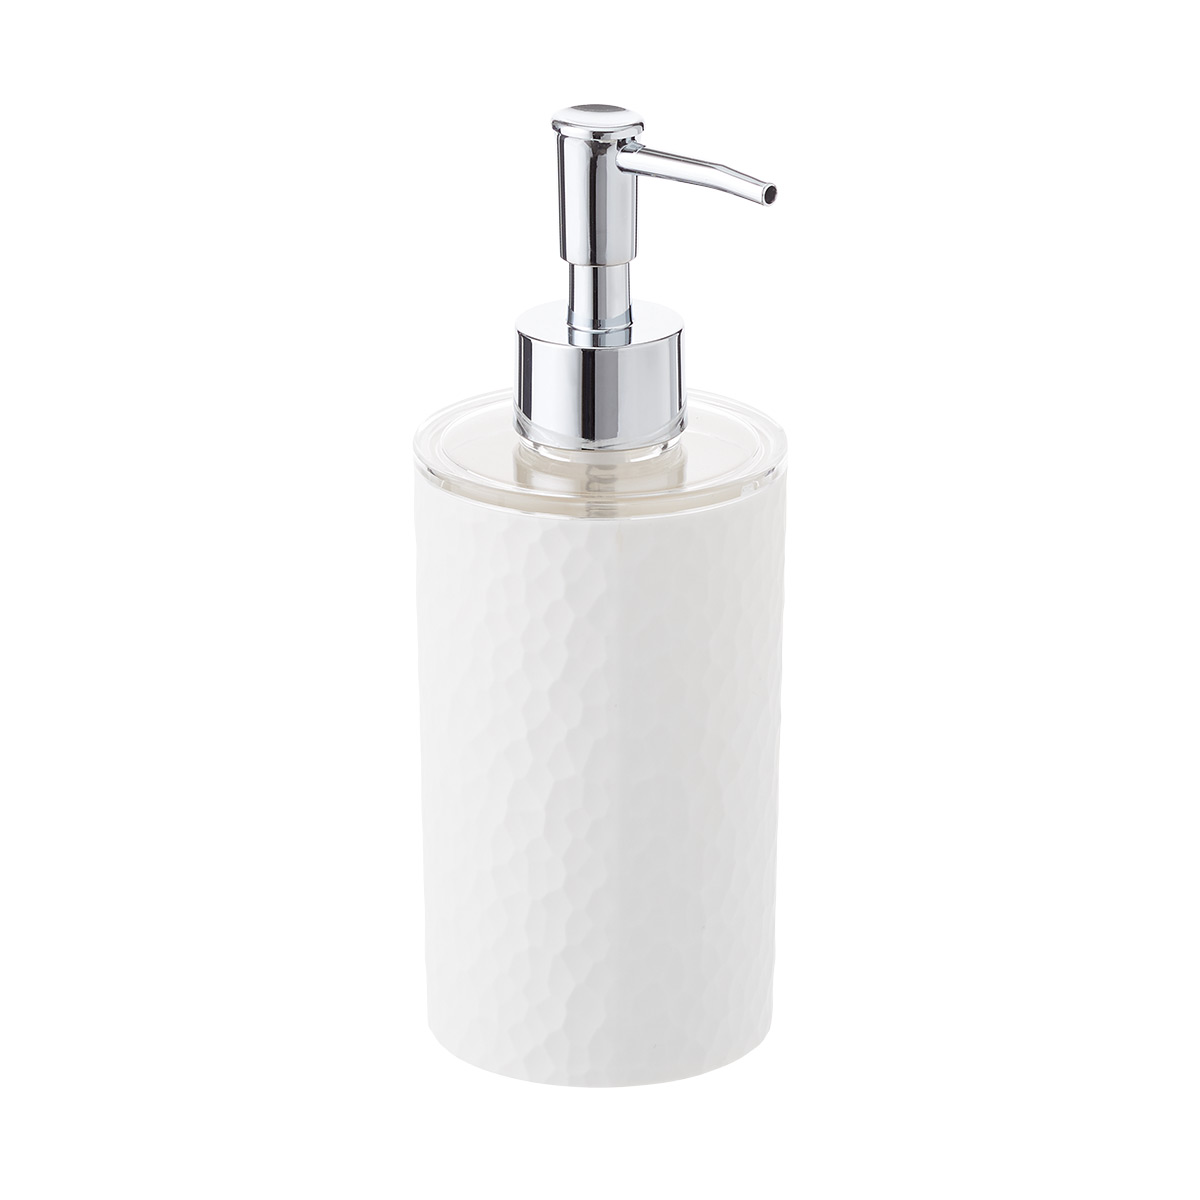 Alpine Soap Pump Dispenser